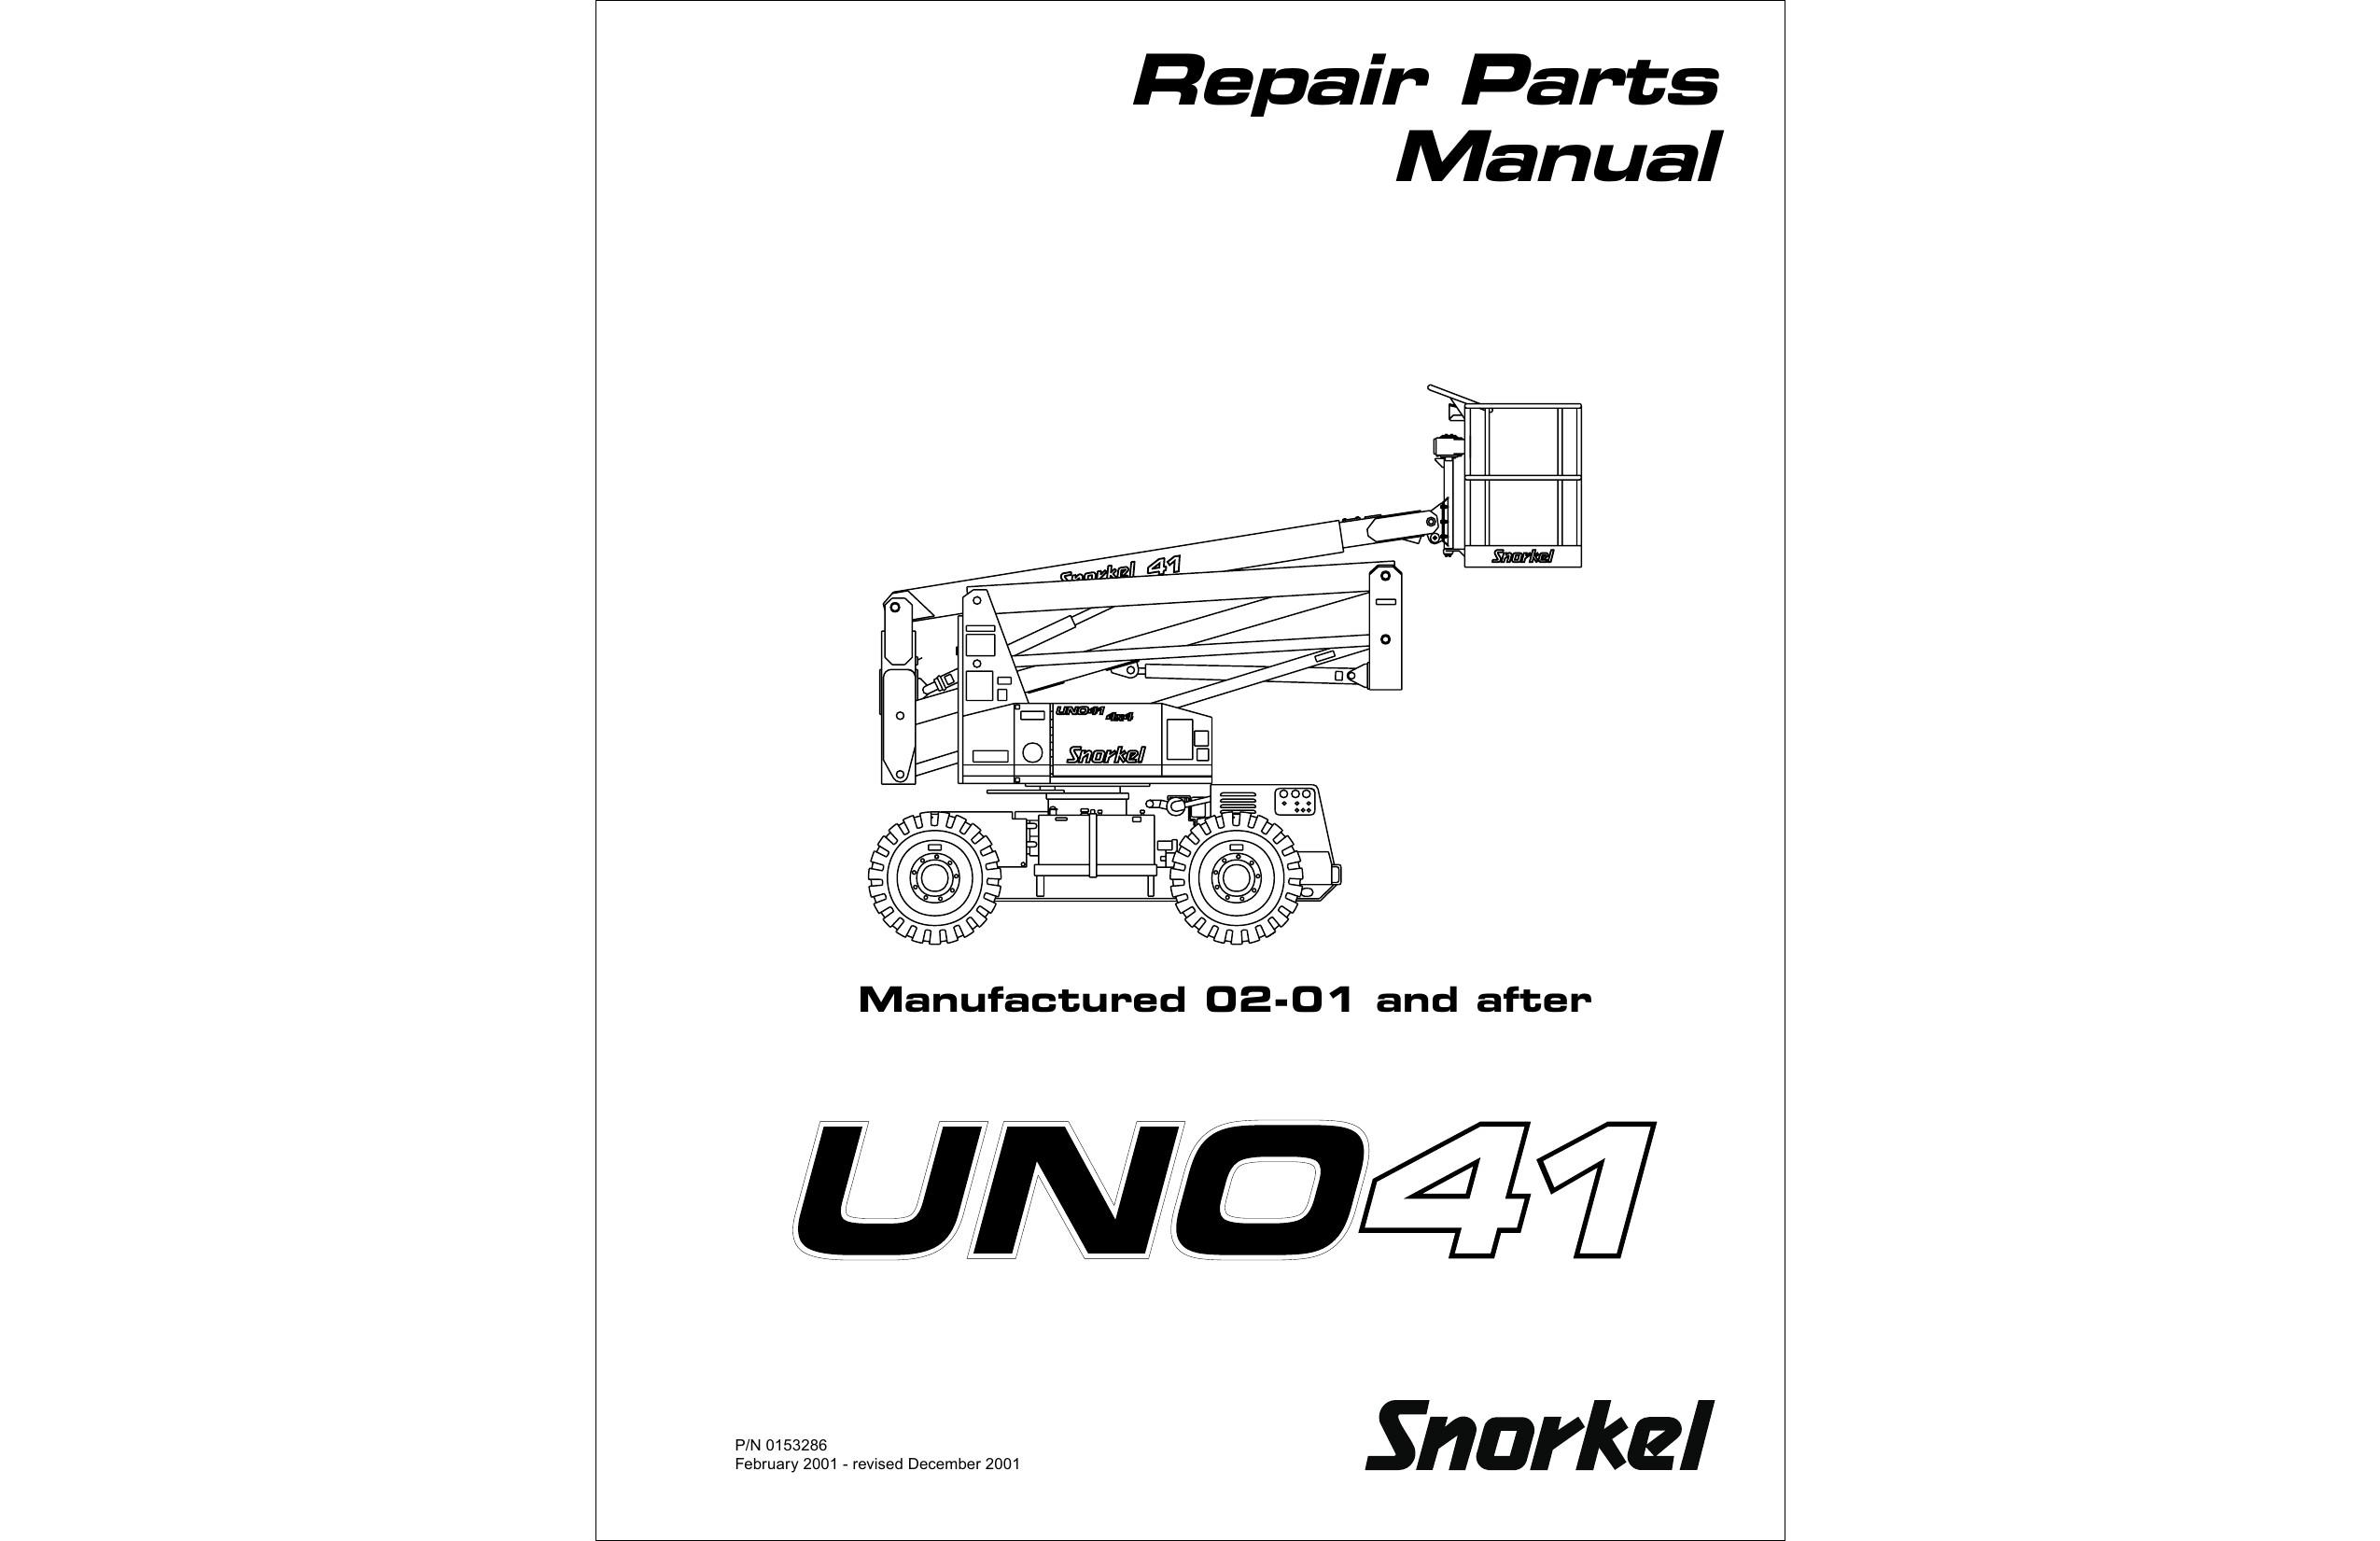 Snorkel Tb80 Wirreing Diagram Repair Parts Manual Of Snorkel Tb80 Wirreing Diagram